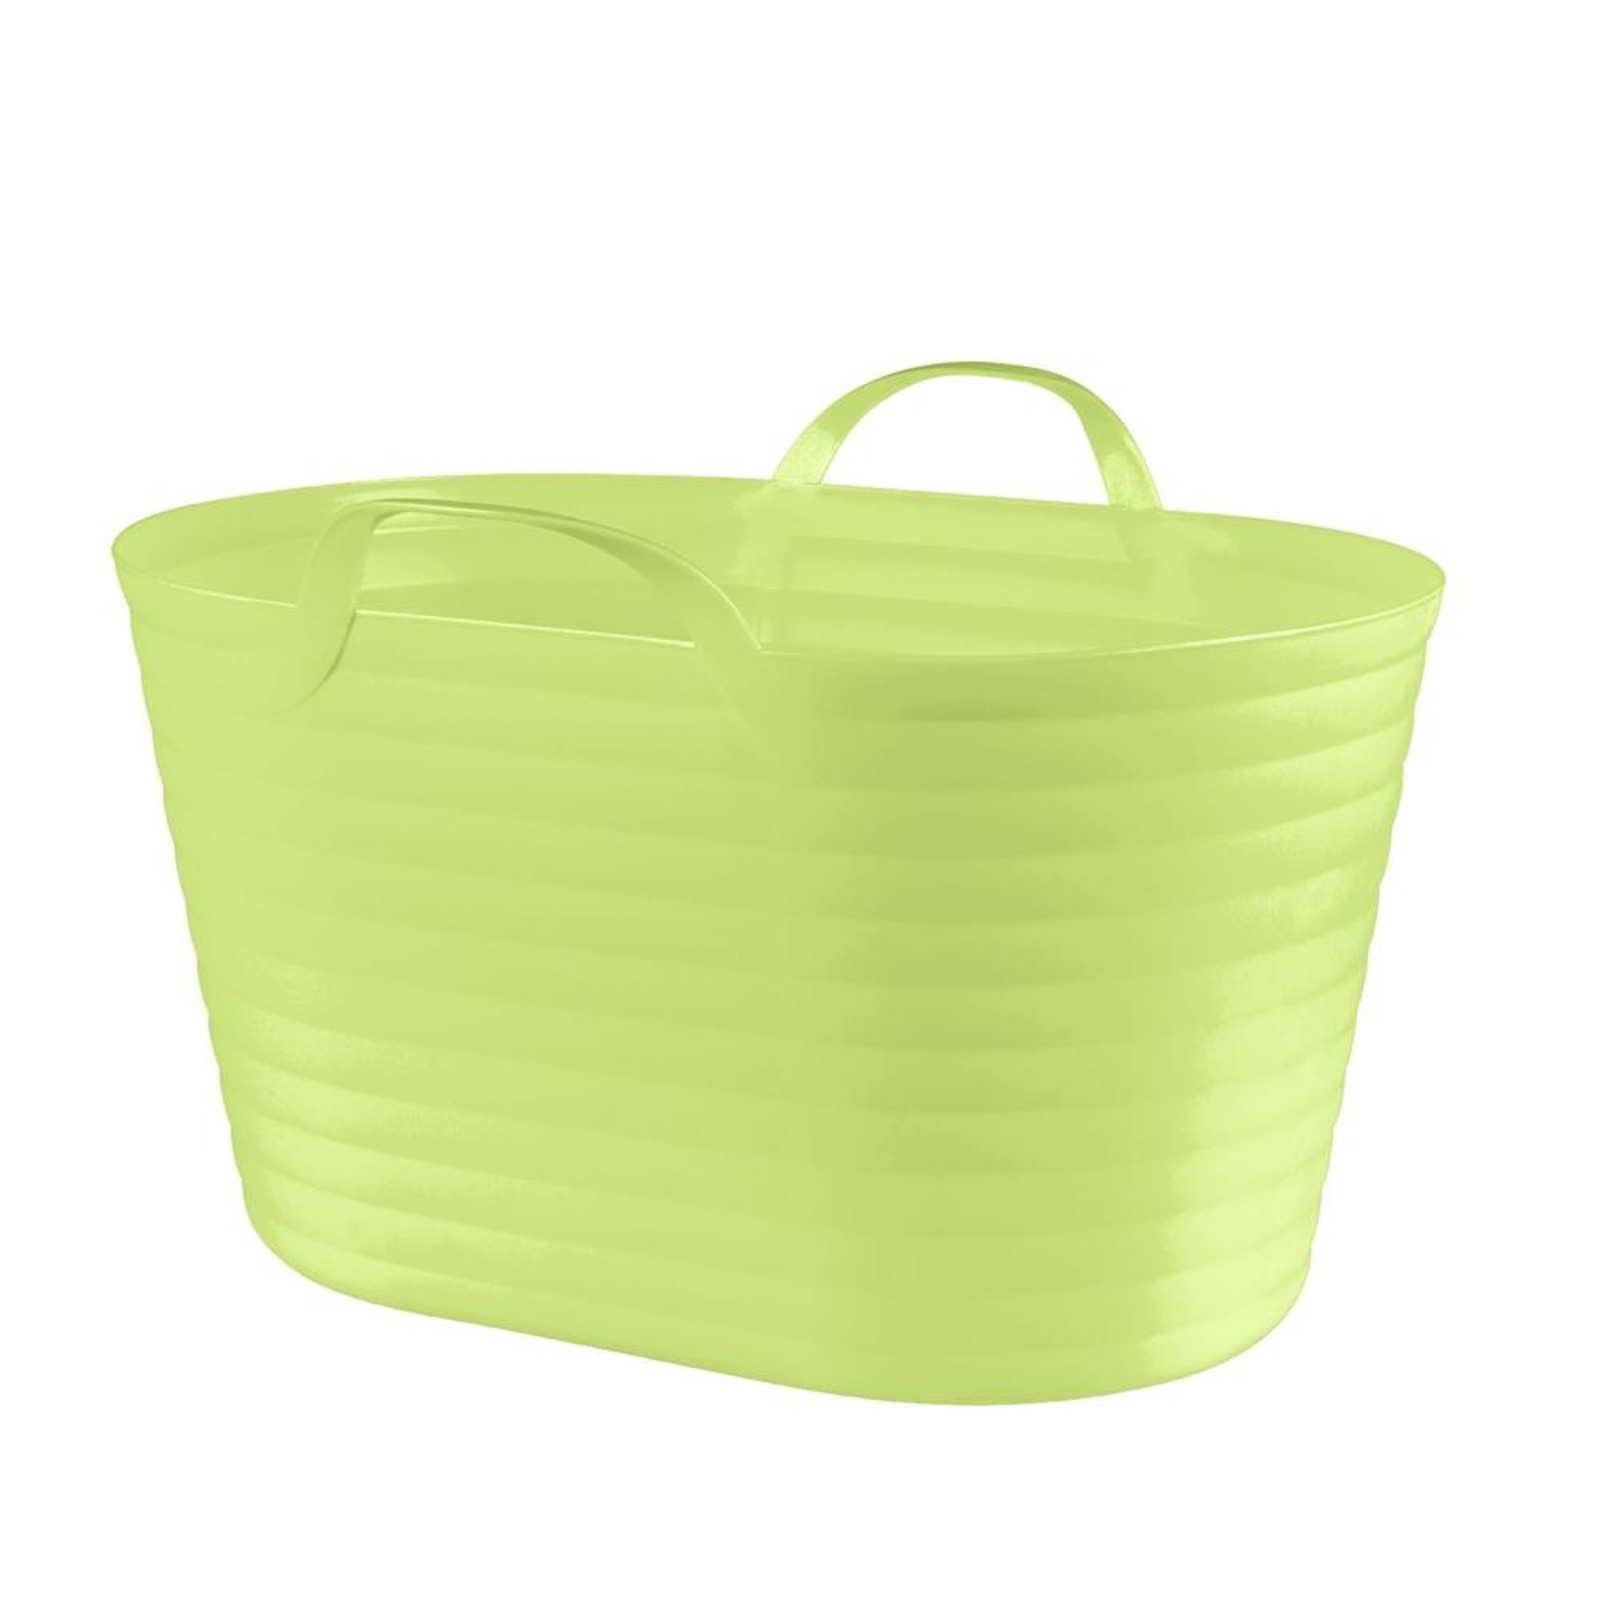 Keter 42L Oval Flexible Tub Green